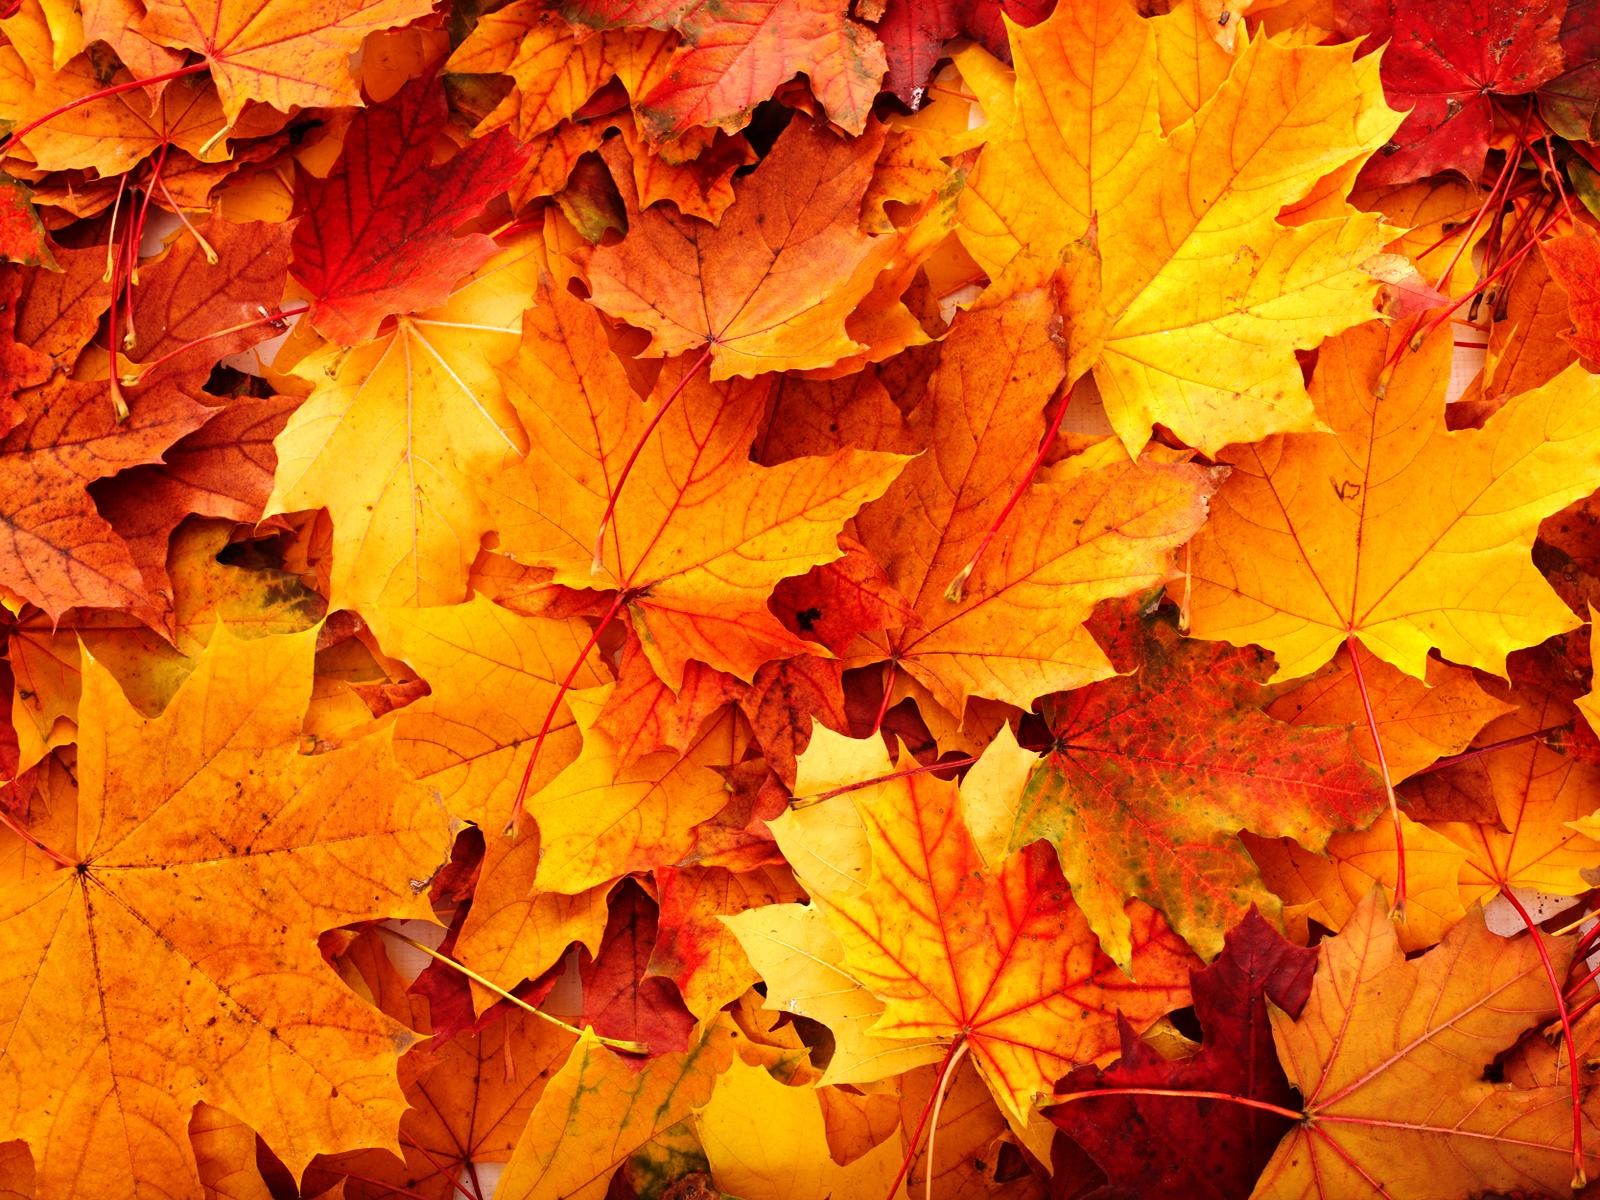 Autumn Leaves Tumblr Delicious autumn 1600x1200